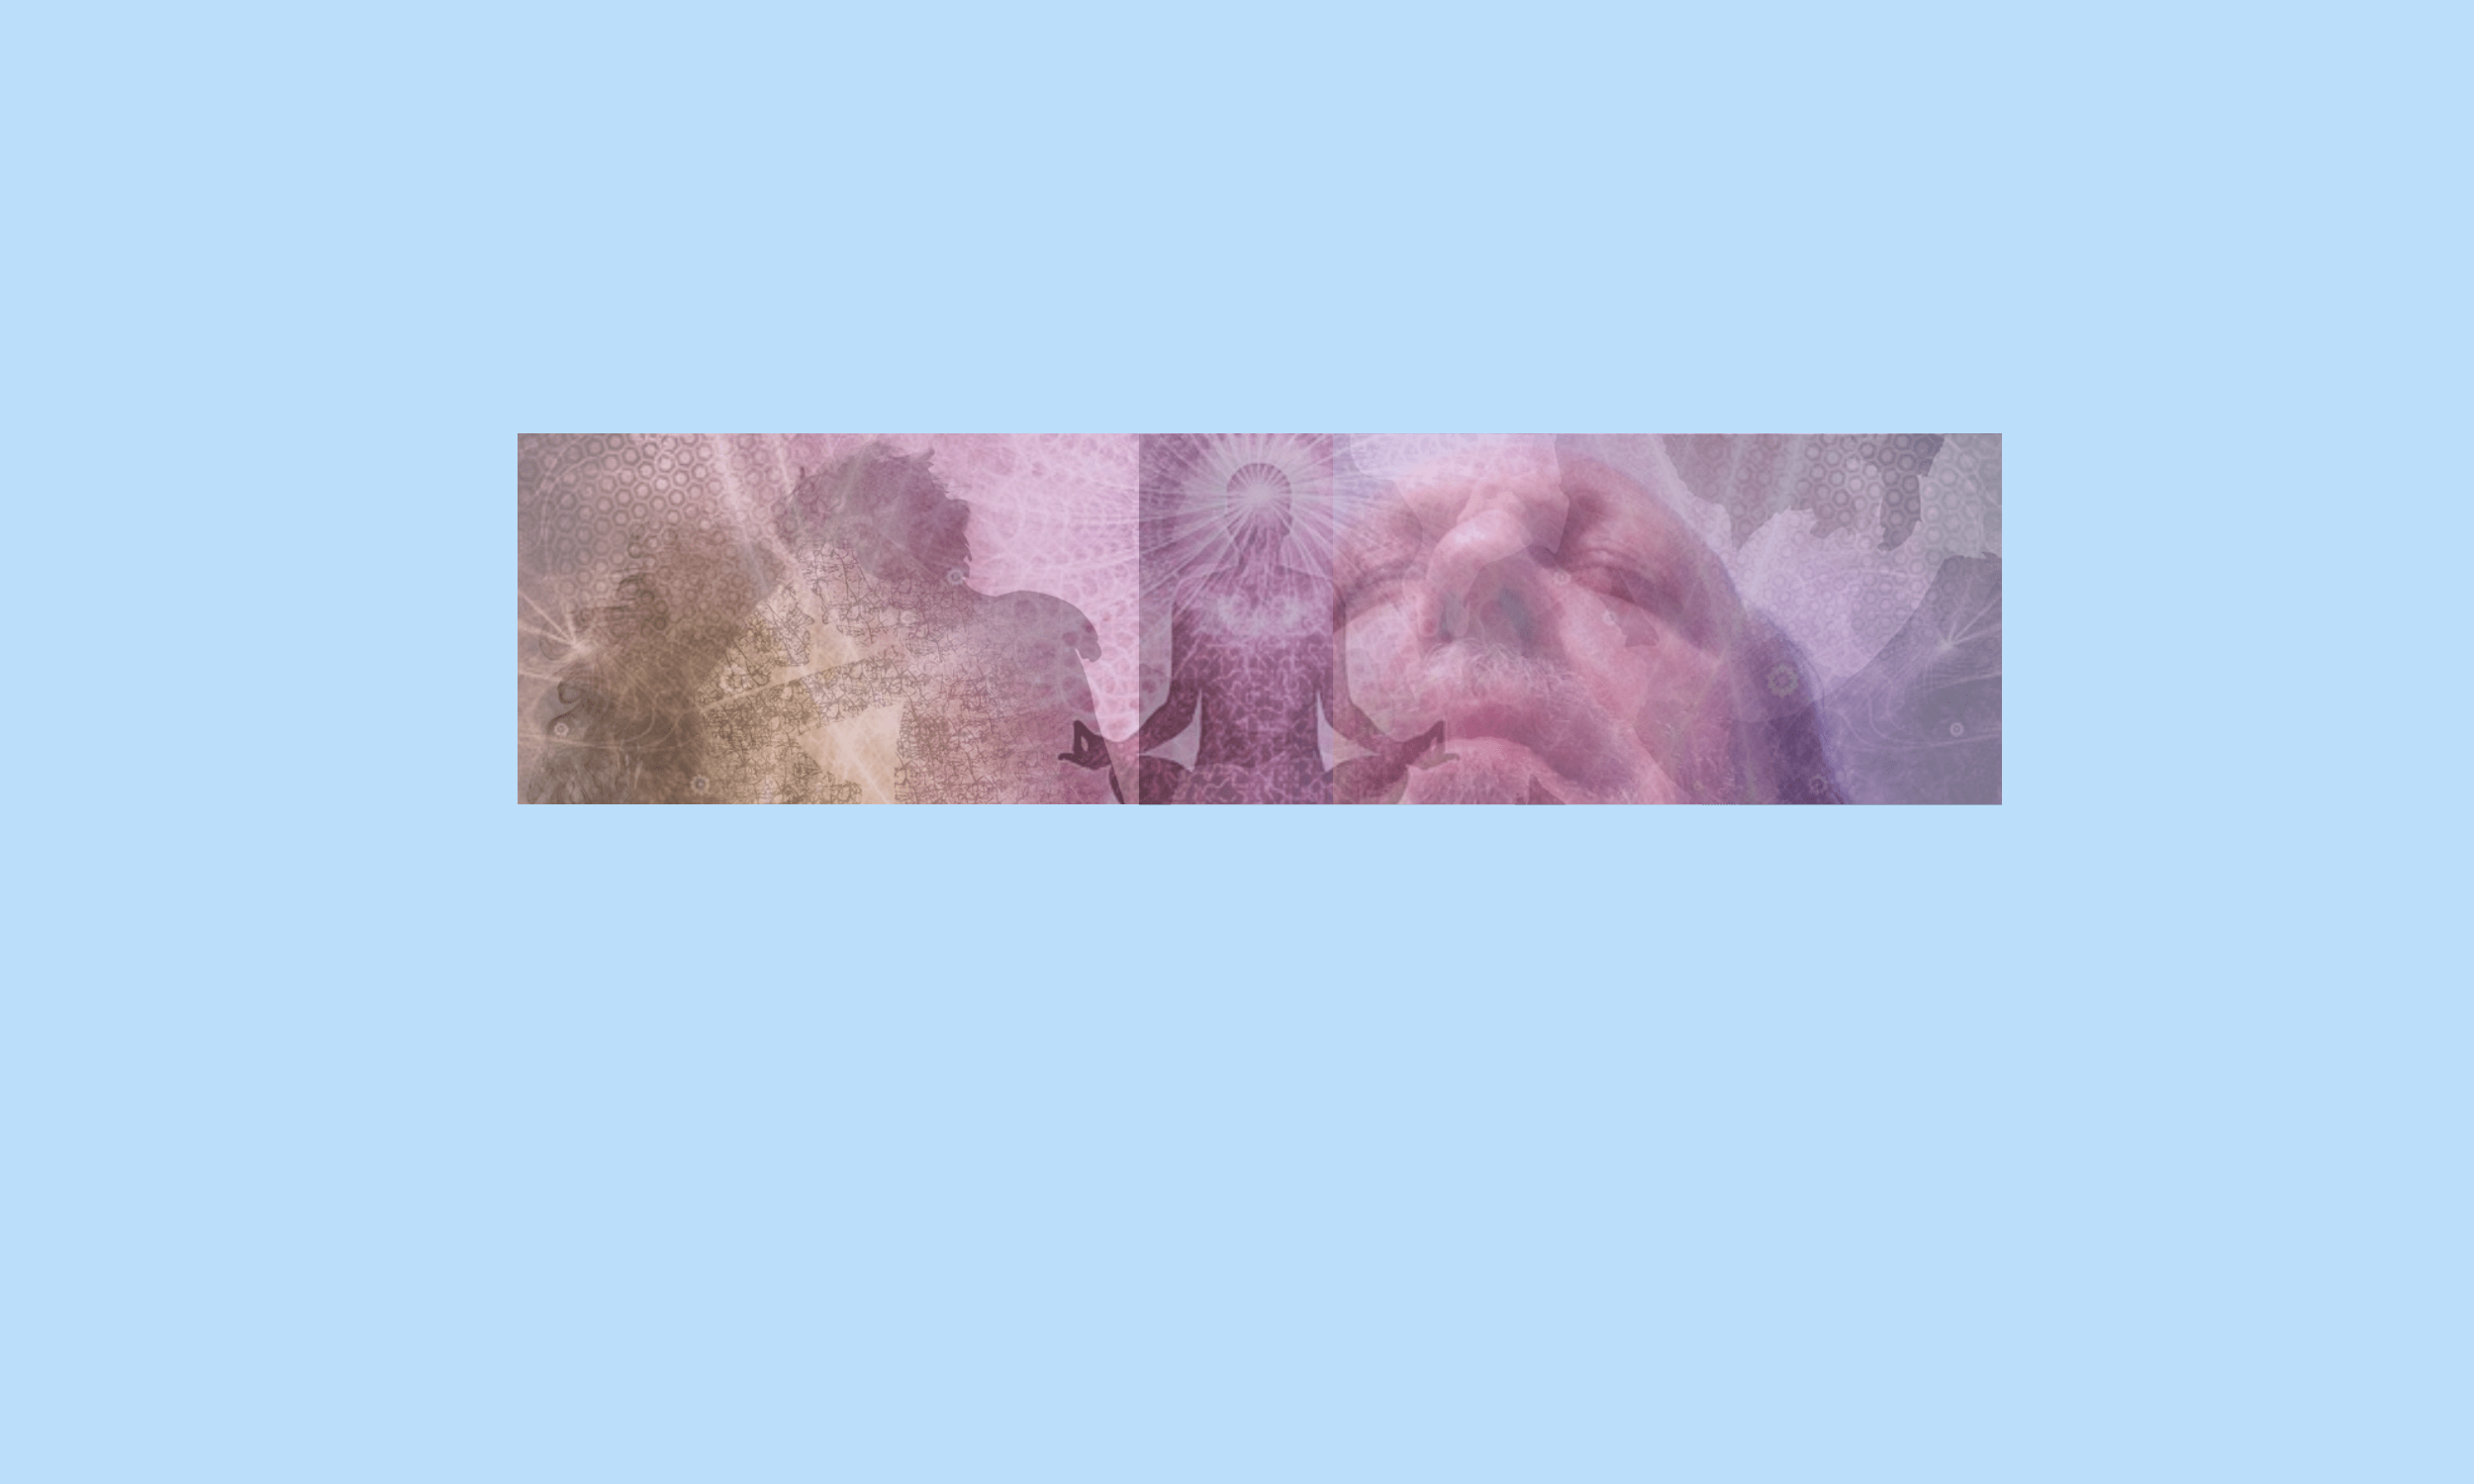 Poster,                White,                 Free Image